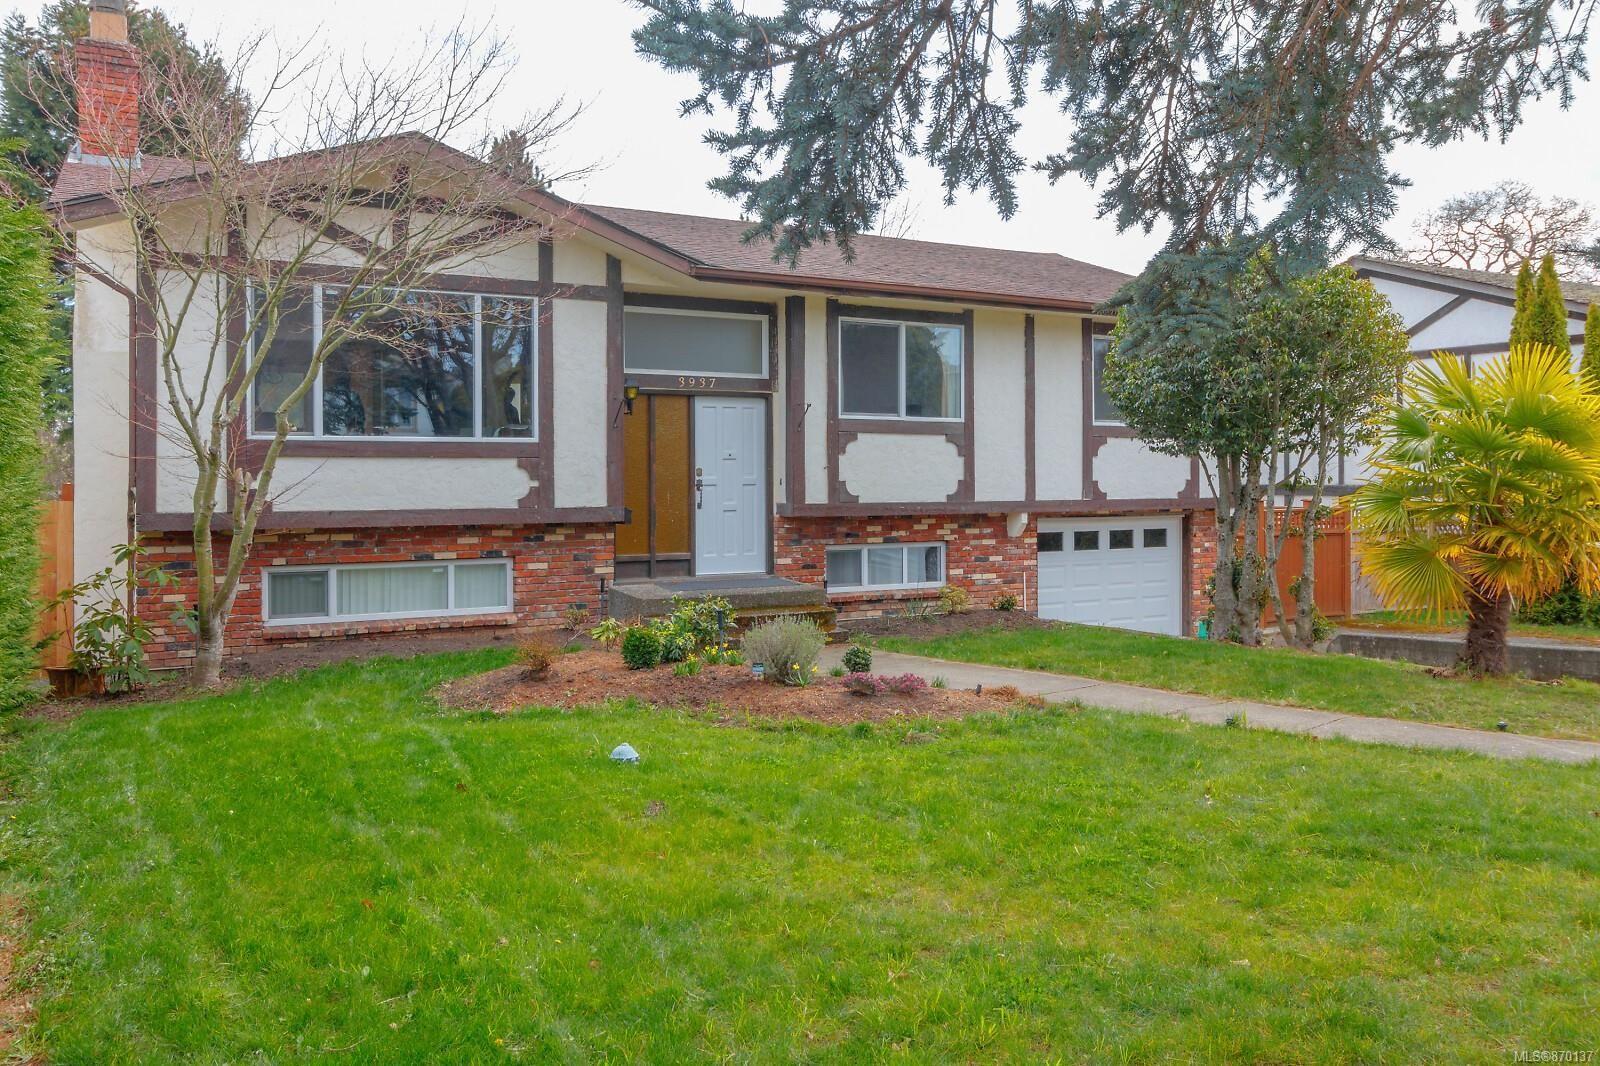 Main Photo: 3937 Lexington Ave in : SE Arbutus House for sale (Saanich East)  : MLS®# 870137